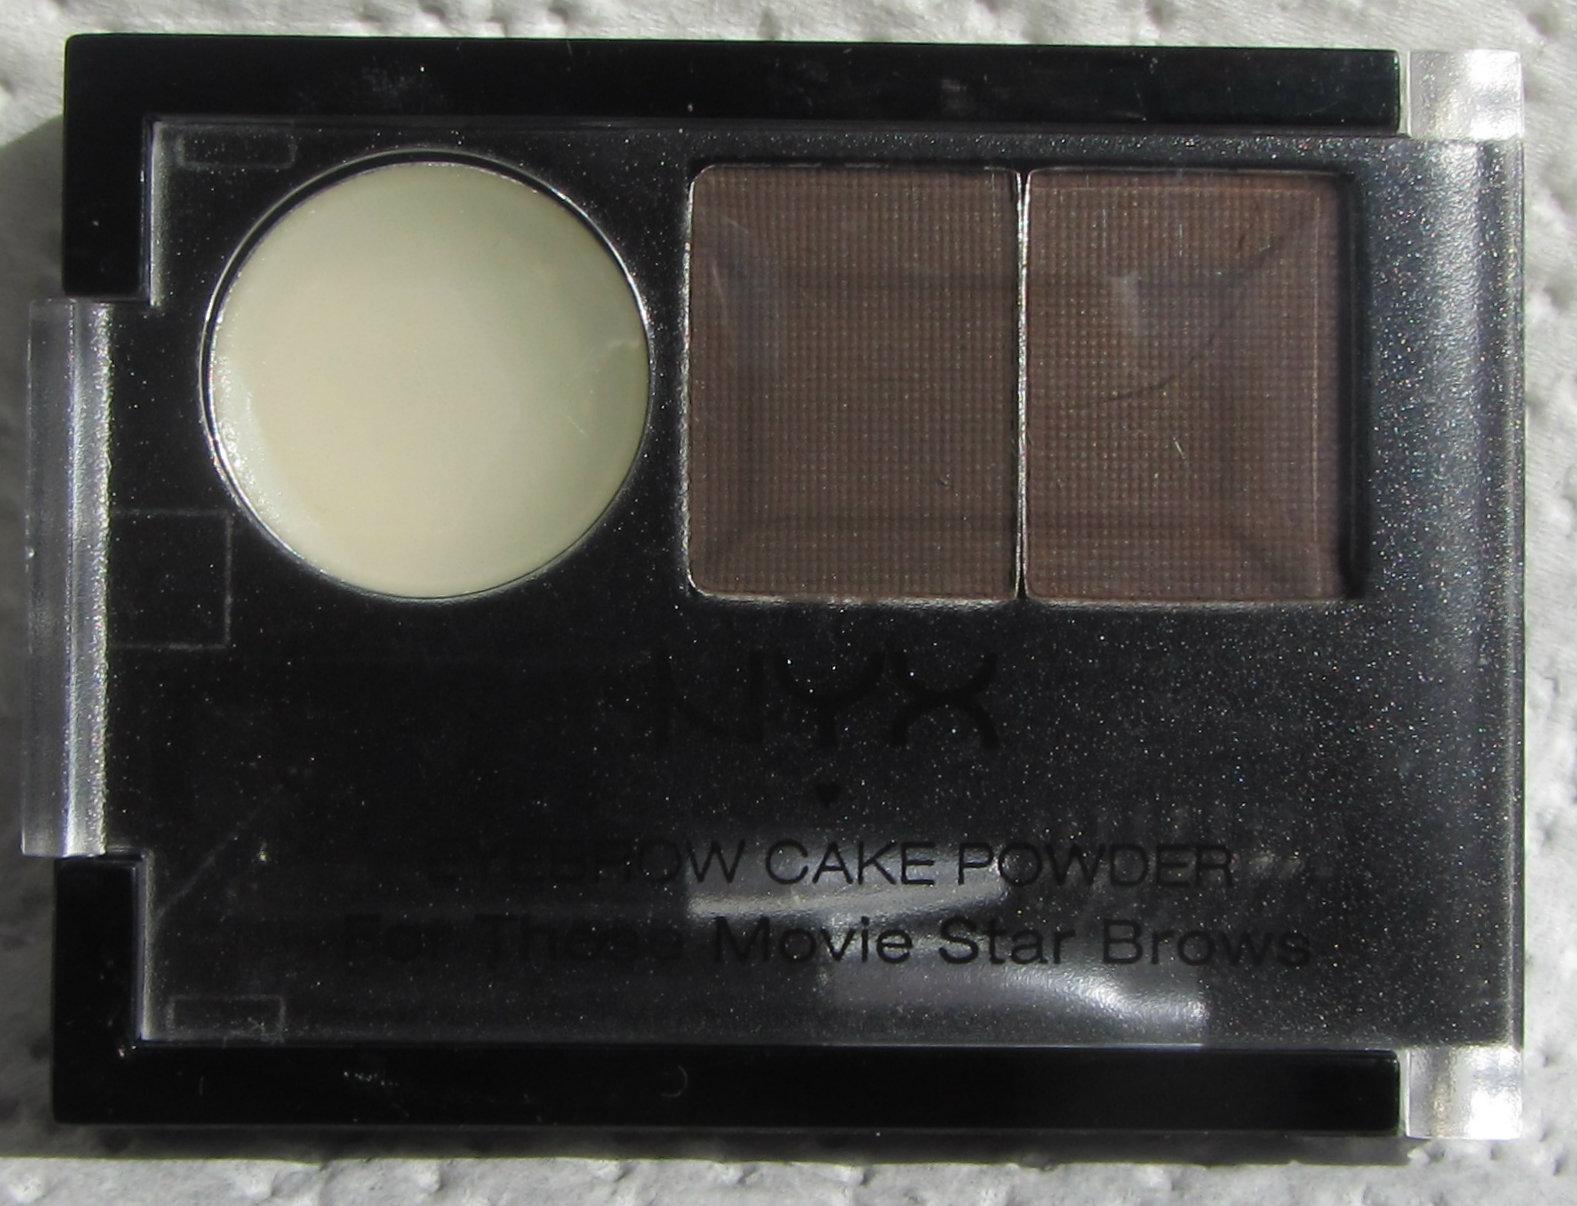 Ninas Bargain Beauty Nyx Eyebrow Cake Powder Review Updated